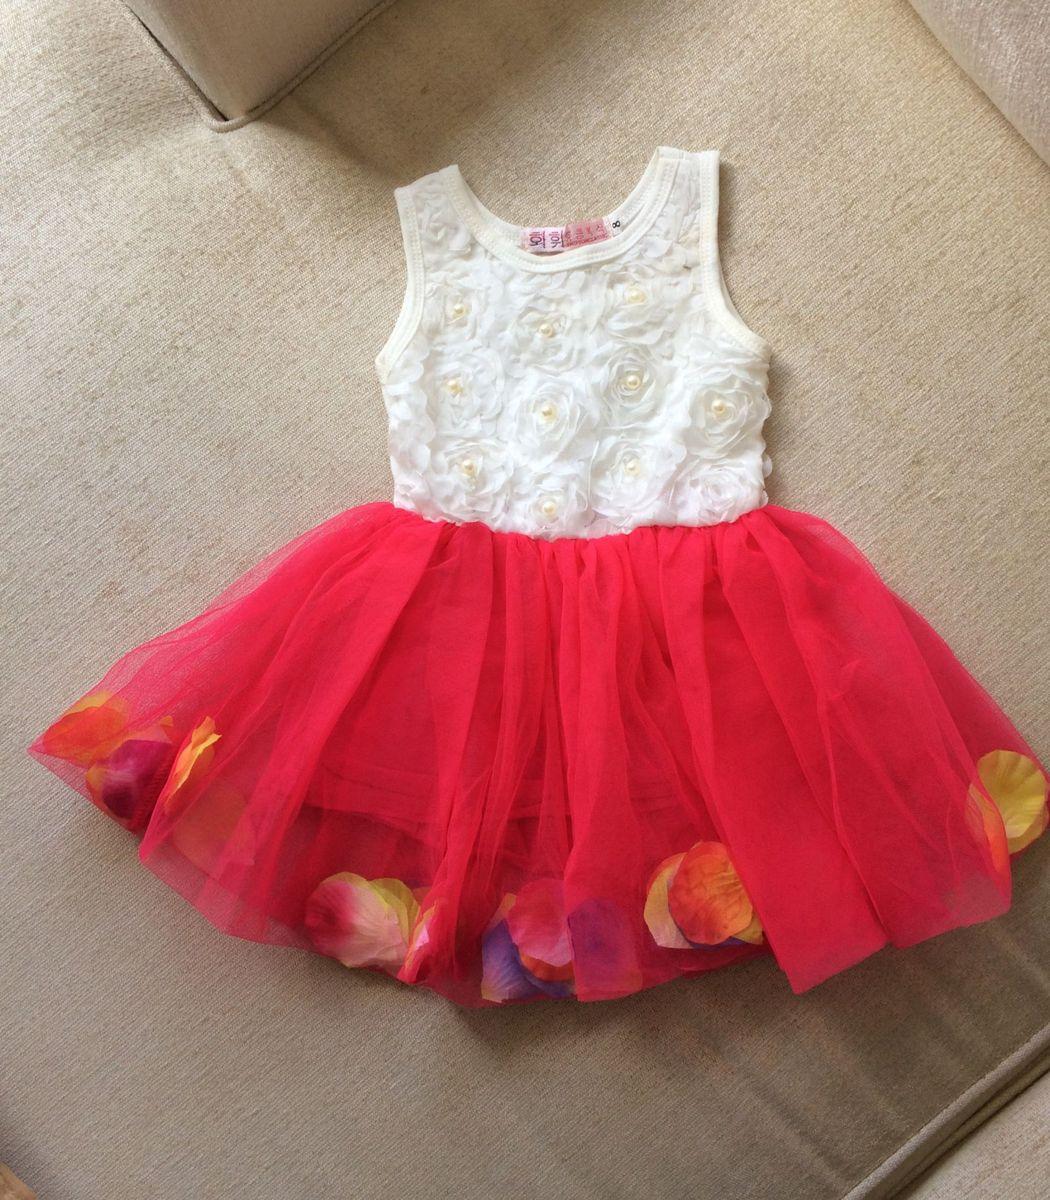 78c7d0cdf0 vestido de festa - menina importado.  Czm6ly9wag90b3muzw5qb2vplmnvbs5ici9wcm9kdwn0cy84ntk0ndcvzji5mtg2zdmwownlm2fmzdzmnzrkngm4zdfkndq4zdmuanbn